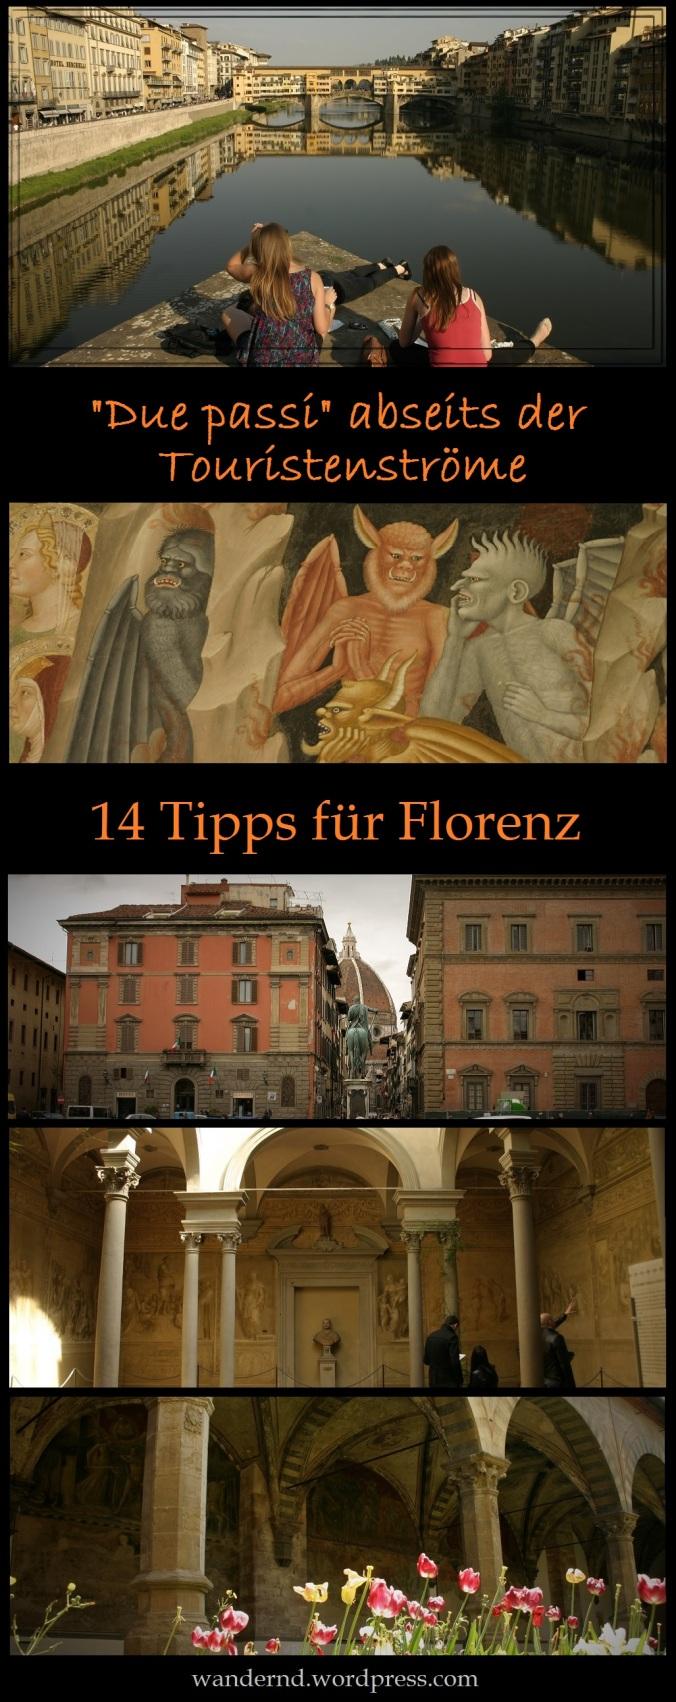 14 Tipps